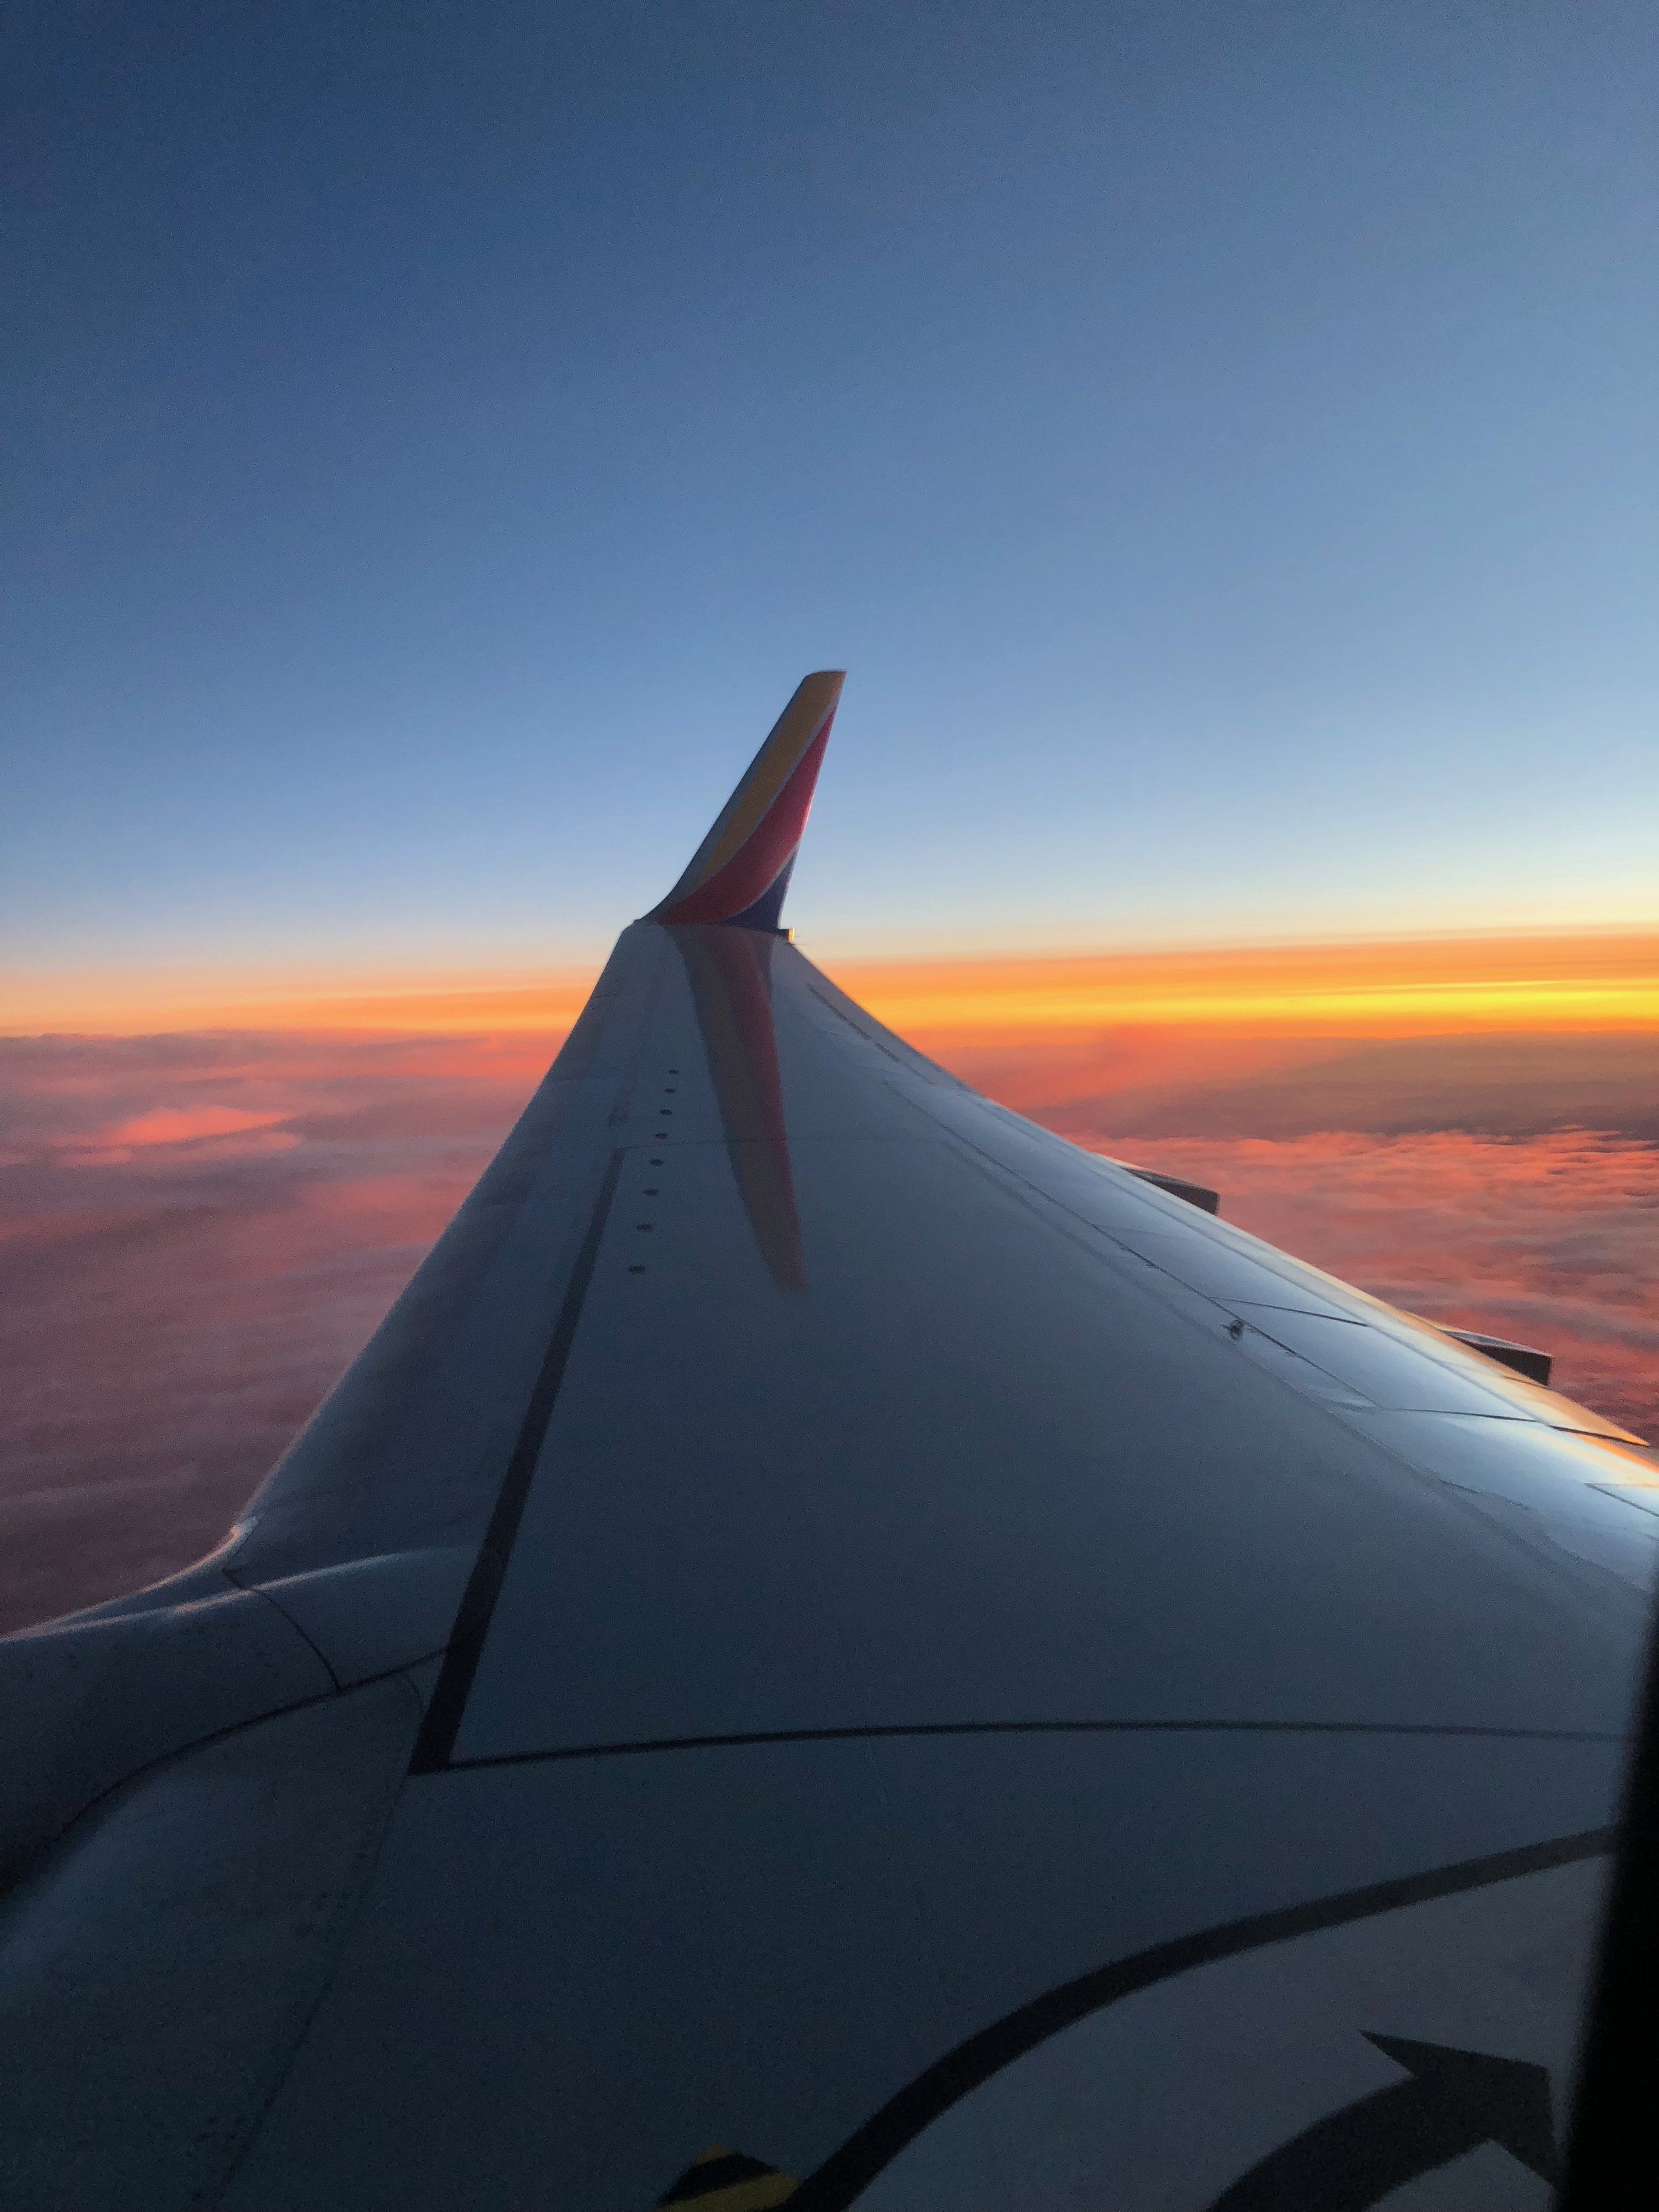 The perks of evening flights.